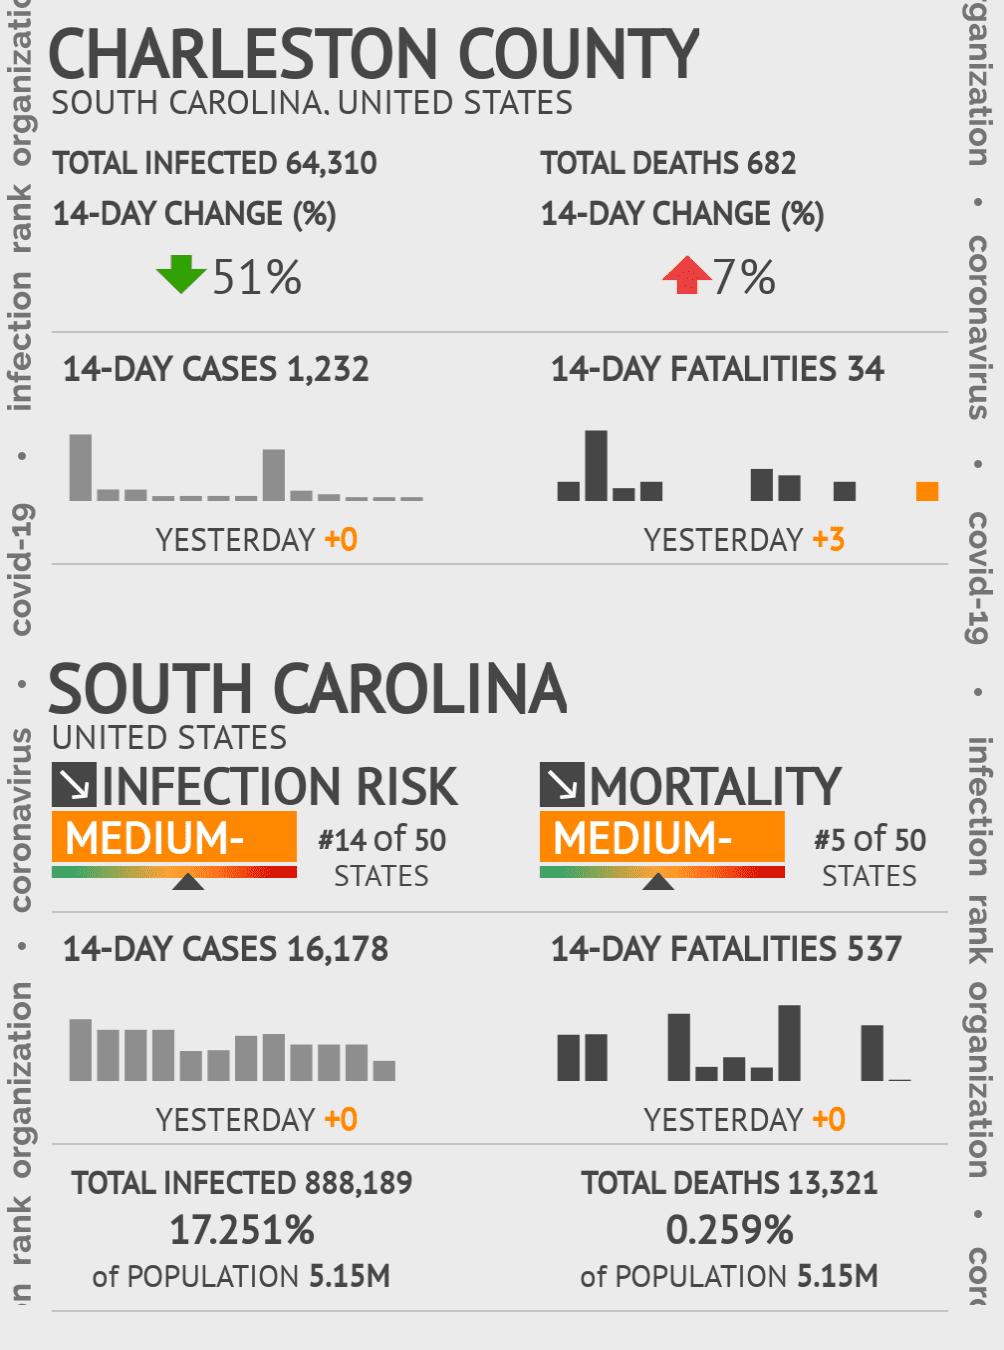 Charleston County Coronavirus Covid-19 Risk of Infection on July 24, 2021